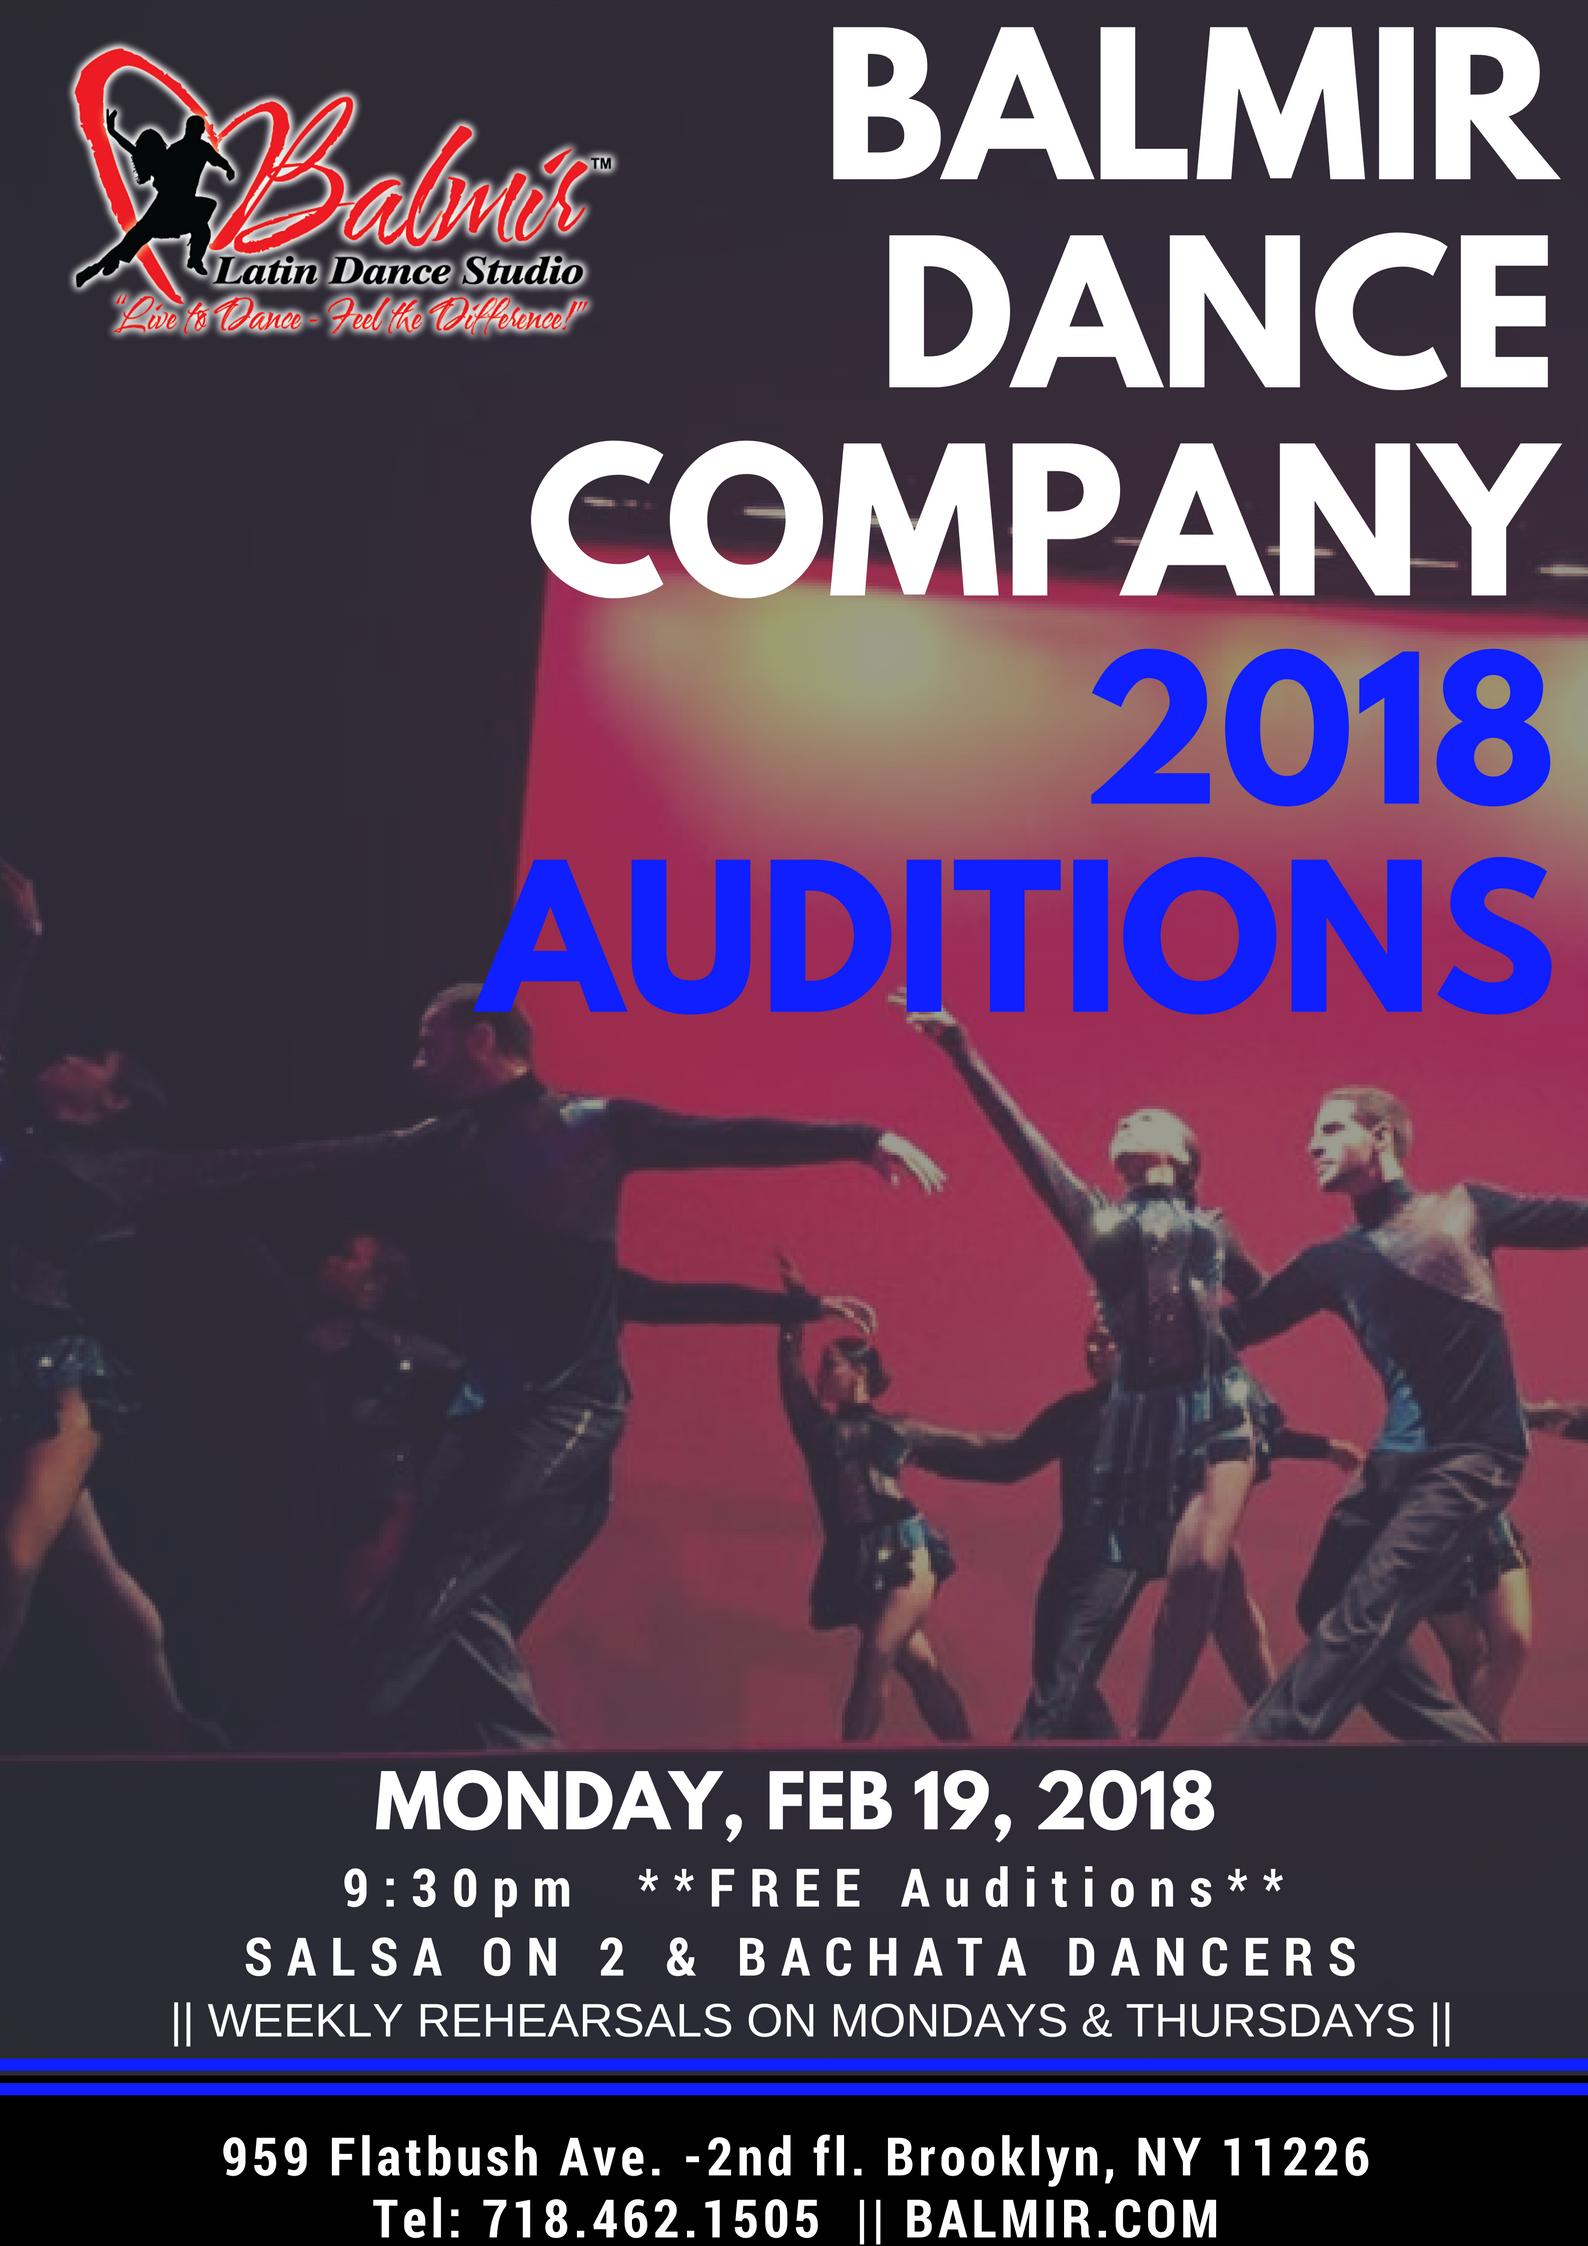 BALMIR LATIN DANCE COMPANY AUDITIONS 2018